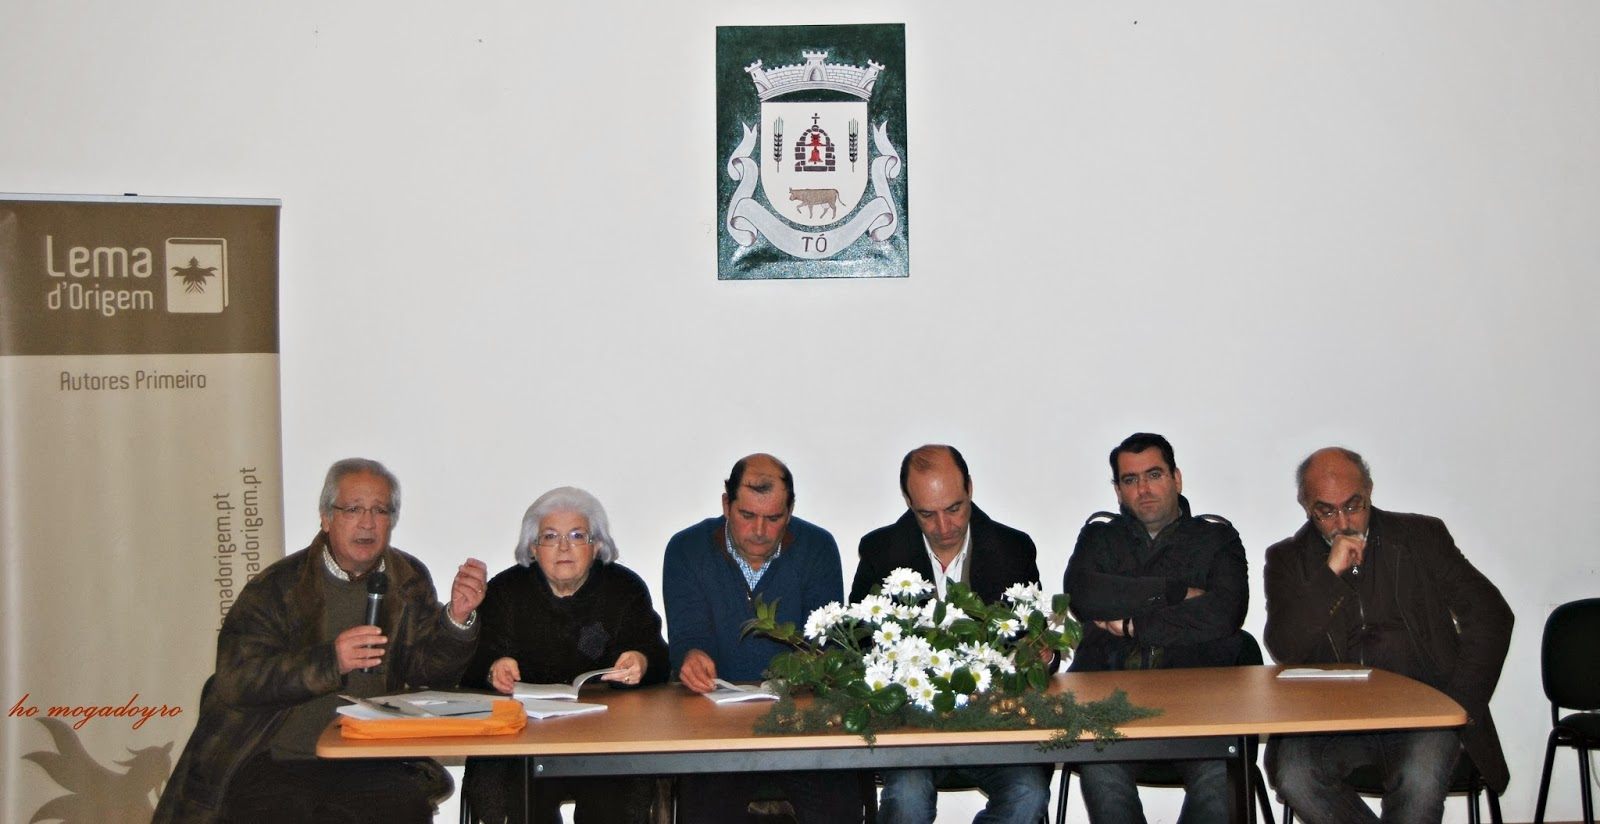 T commune portugal fahnen flaggen fahne flagge for Schneider katalog bestellen privat